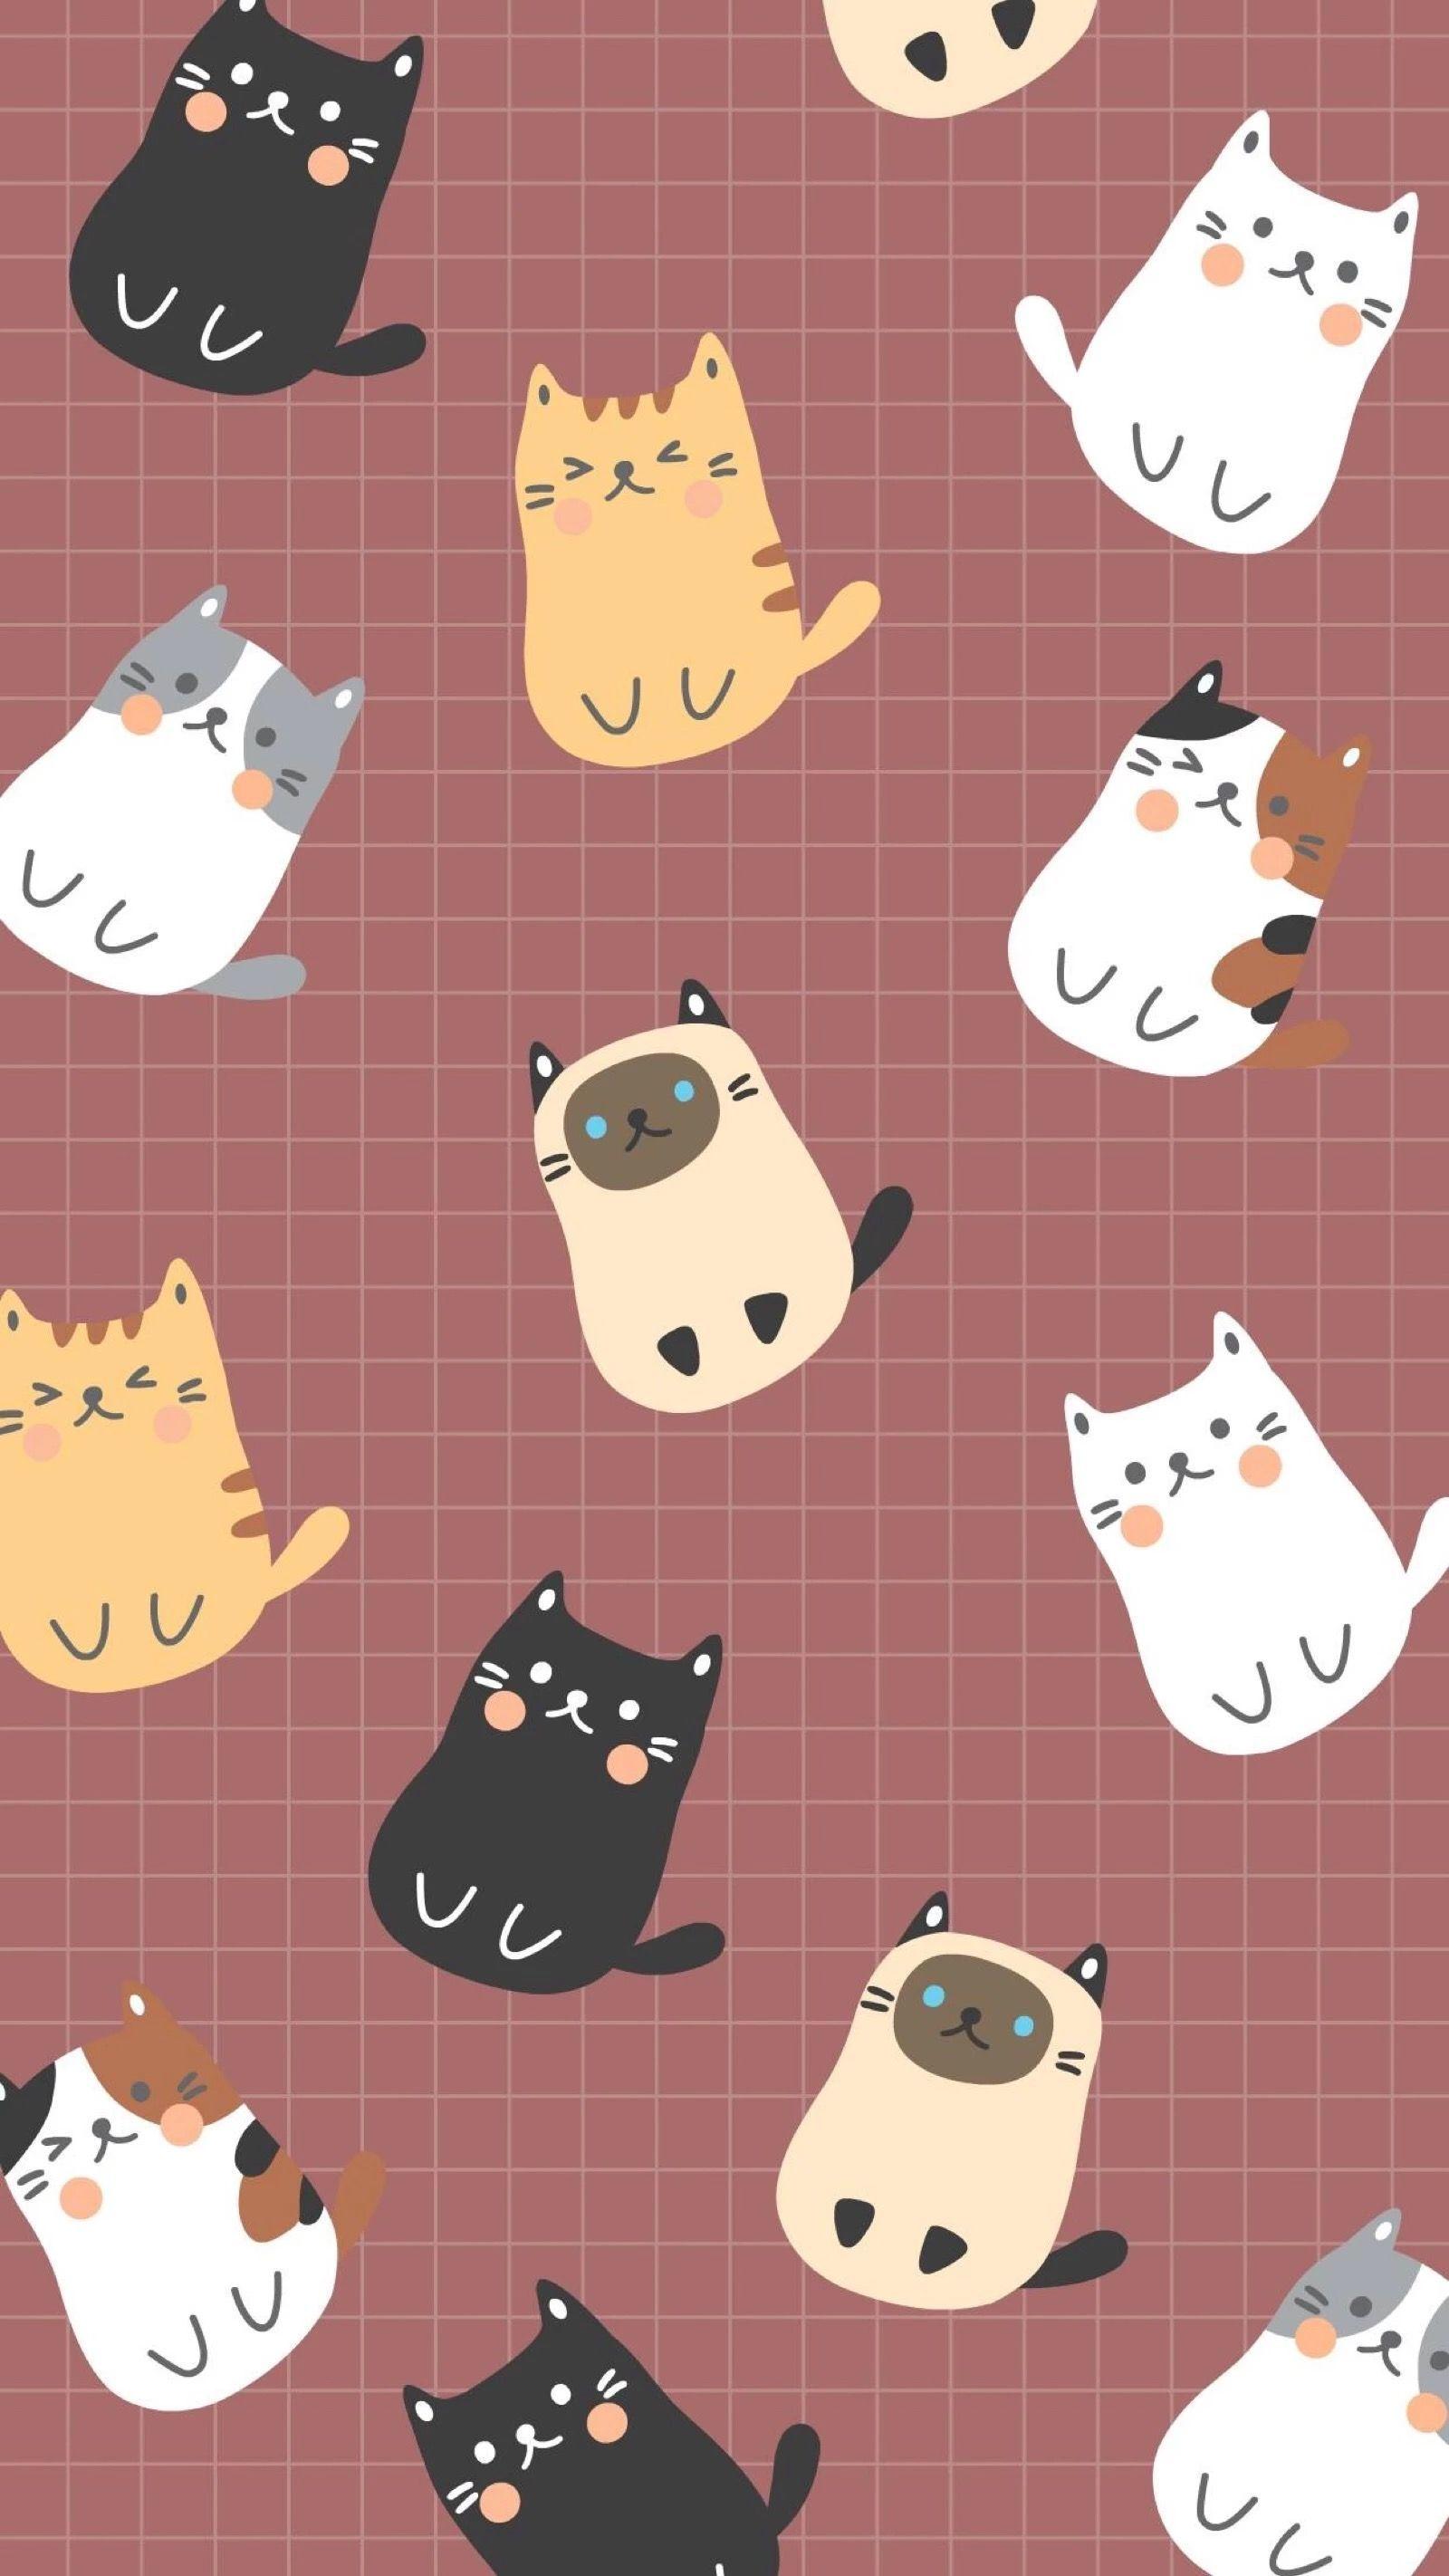 Pin De Nathy V Benavides Em Cat 3 Cute Cat Wallpaper Iphone Binatang Seni Kucing Hewan